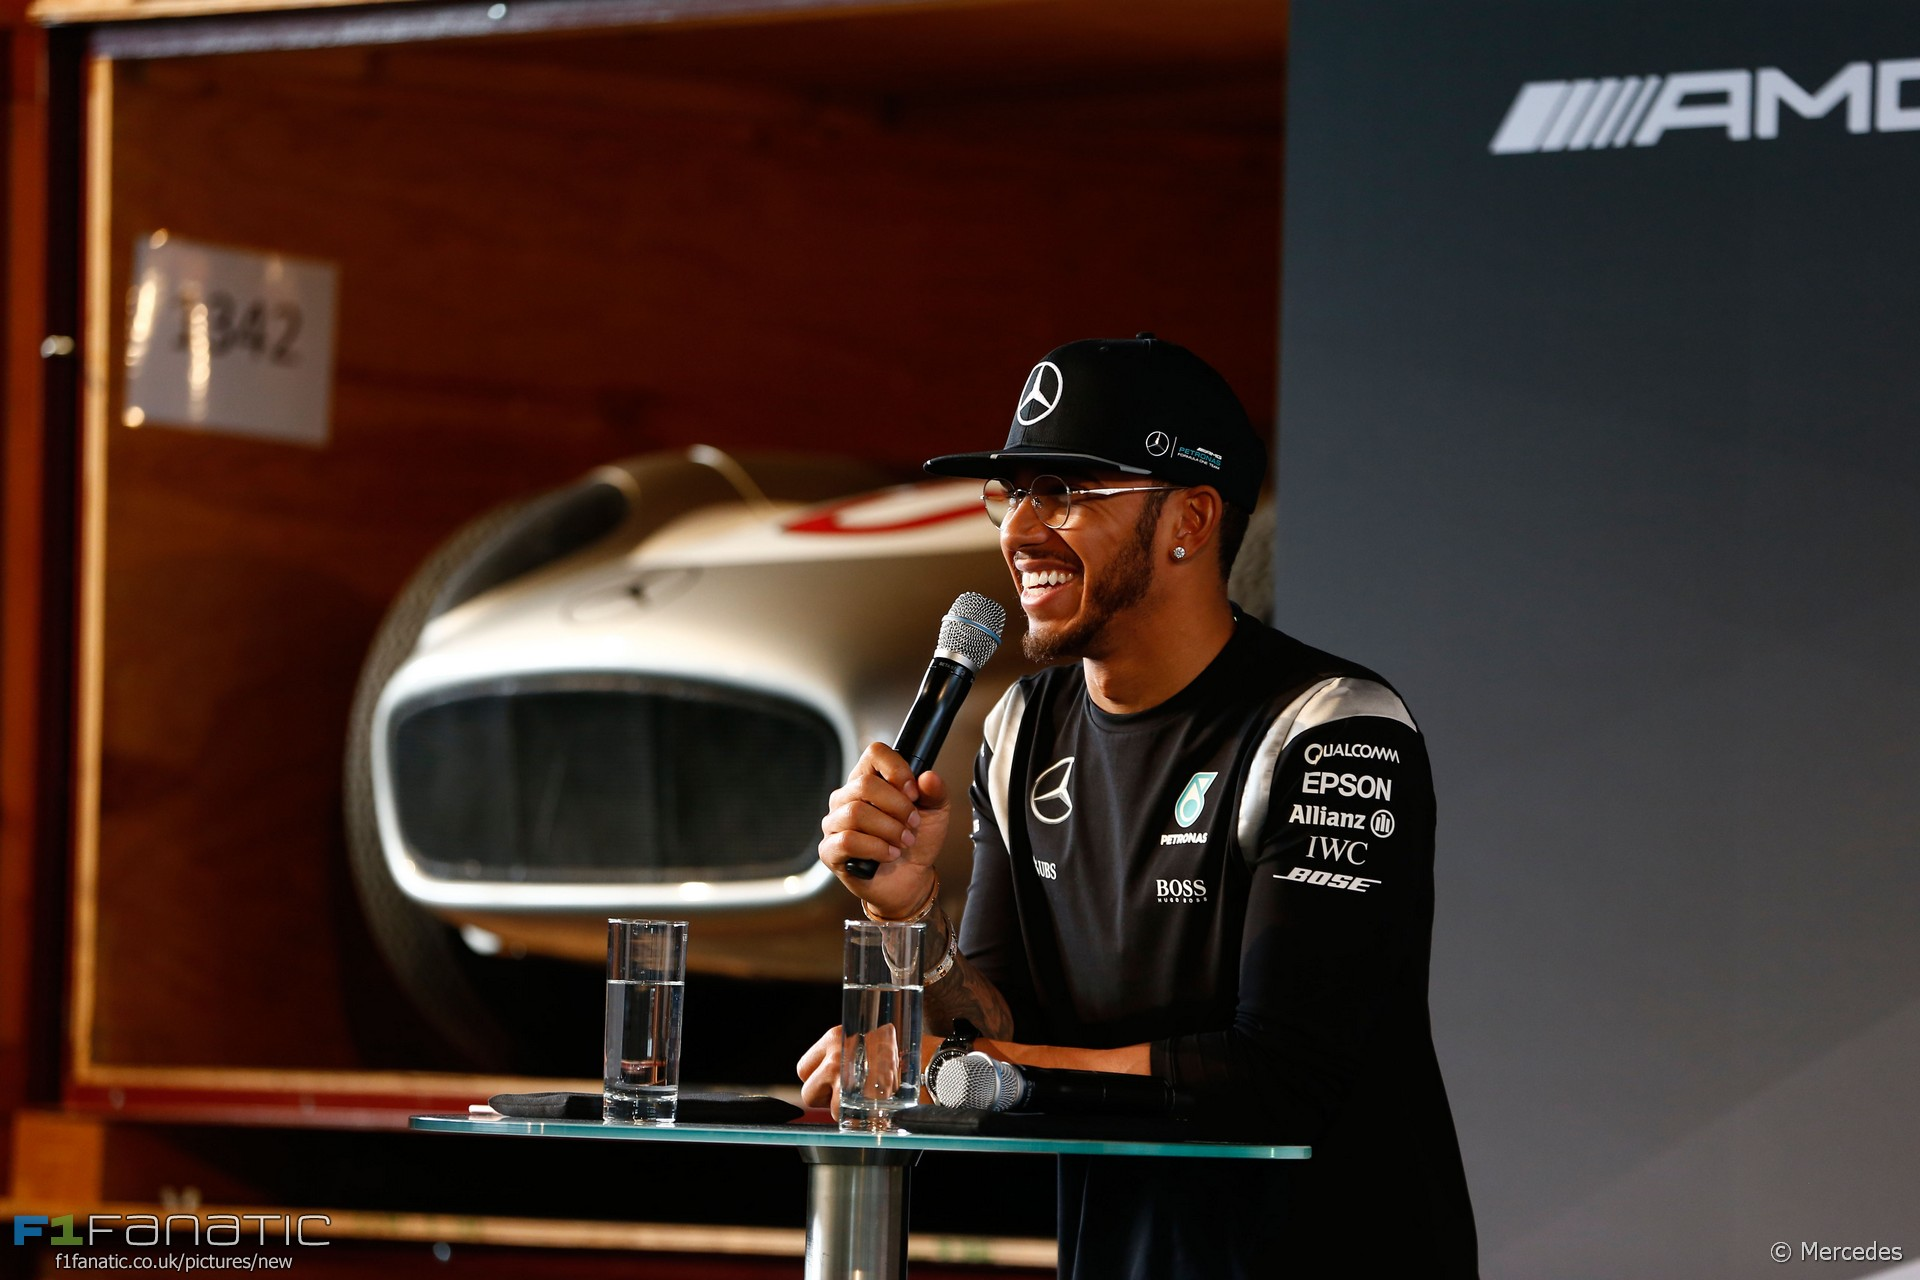 Lewis Hamilton, Mercedes, 2016